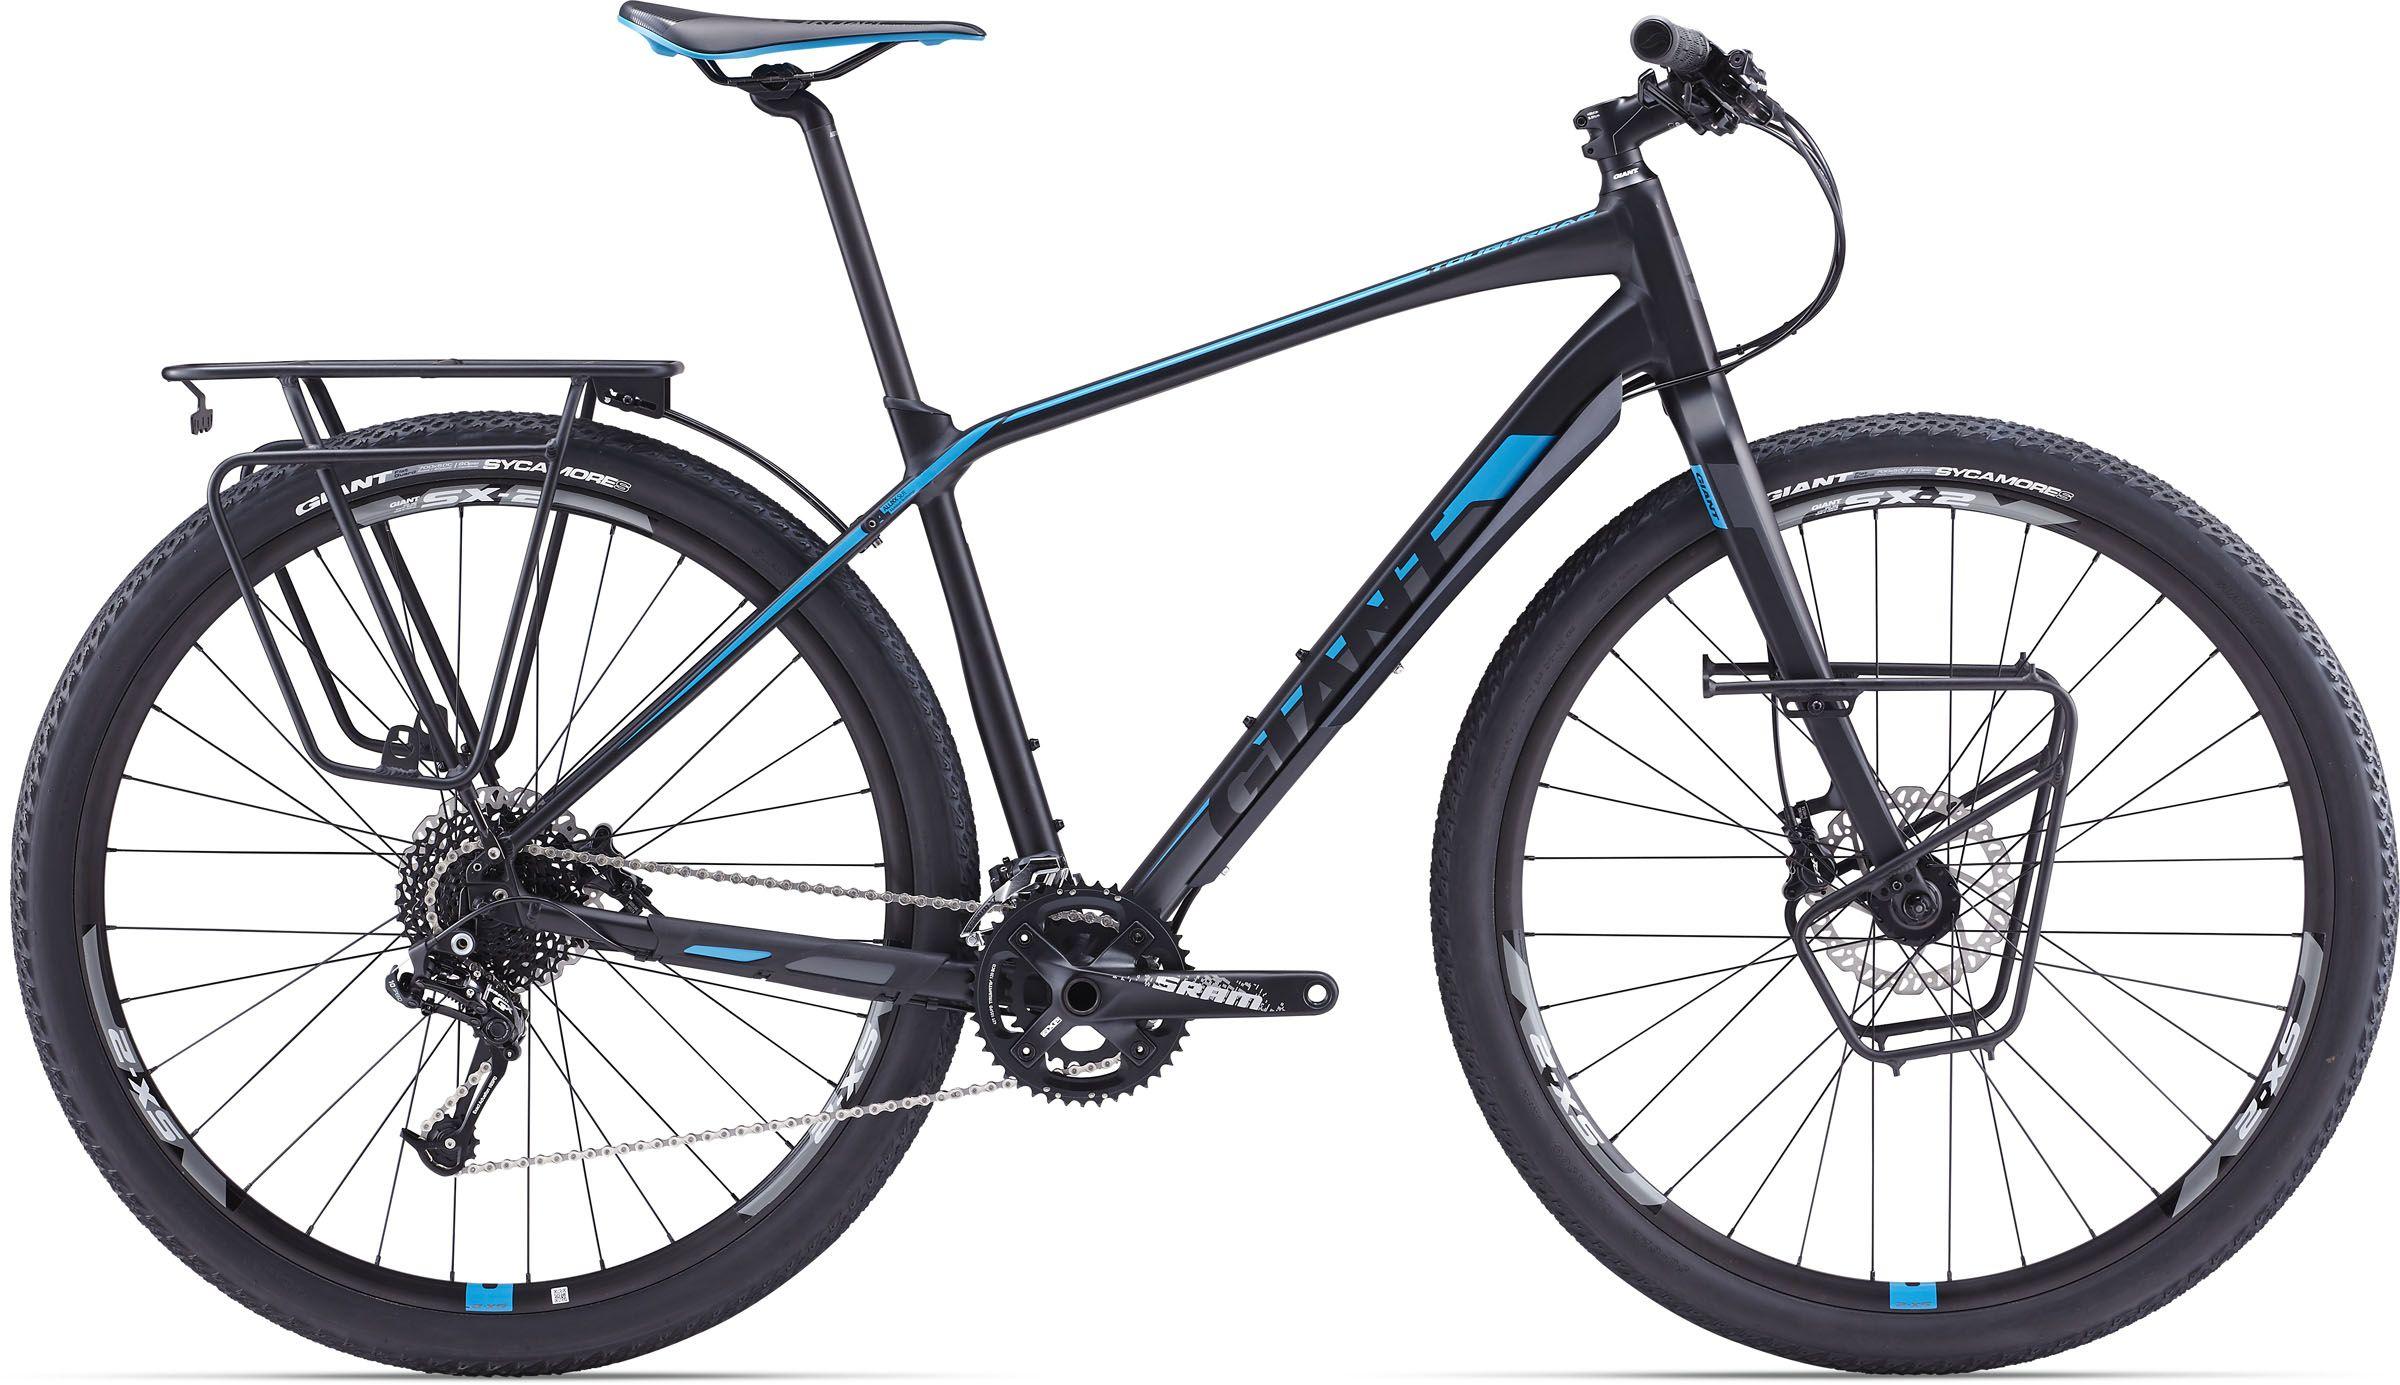 Giant Toughroad Slr 1 Diamond Cycle Montclair Nj 973 509 0233 Giant Bicycles Bicycle Touring Bike